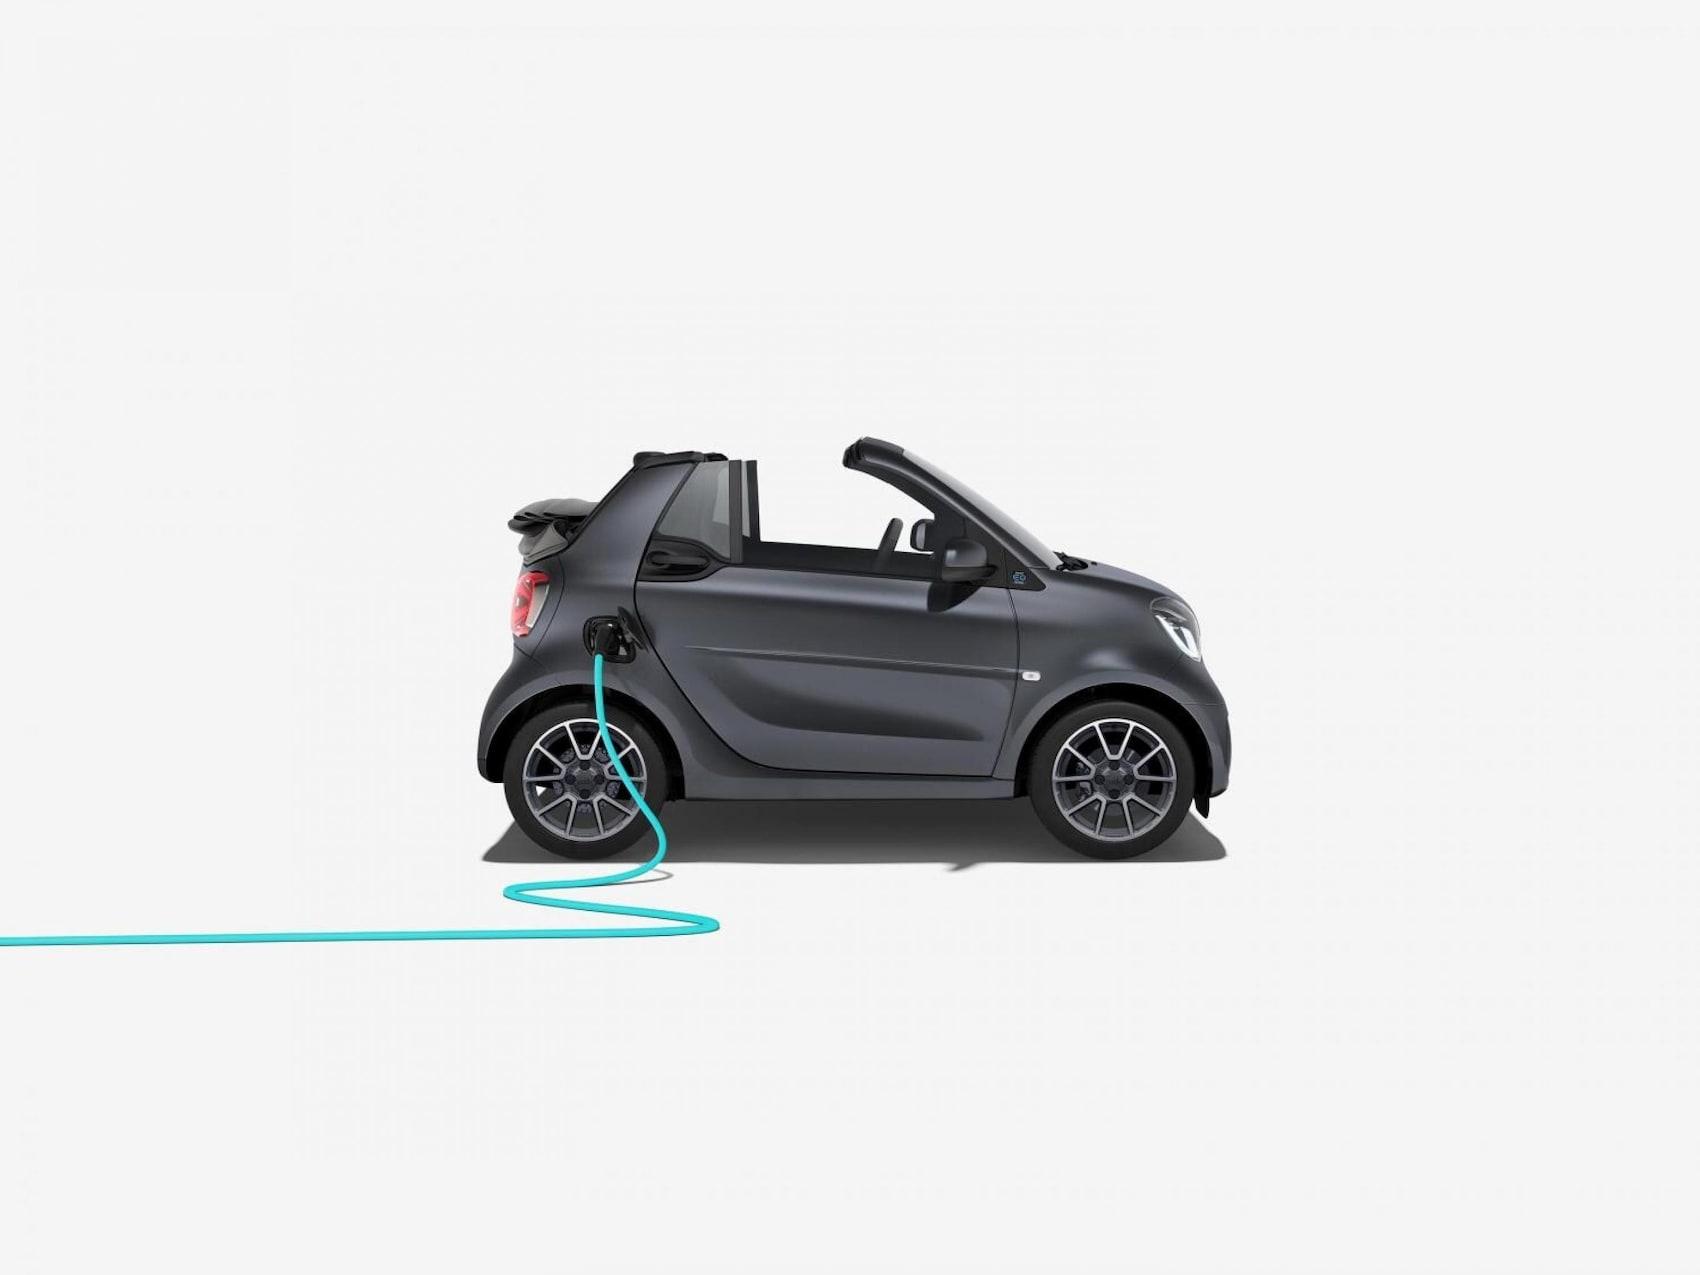 Mercedes-Benz Financial Services smart EQ fortwo suitegrey